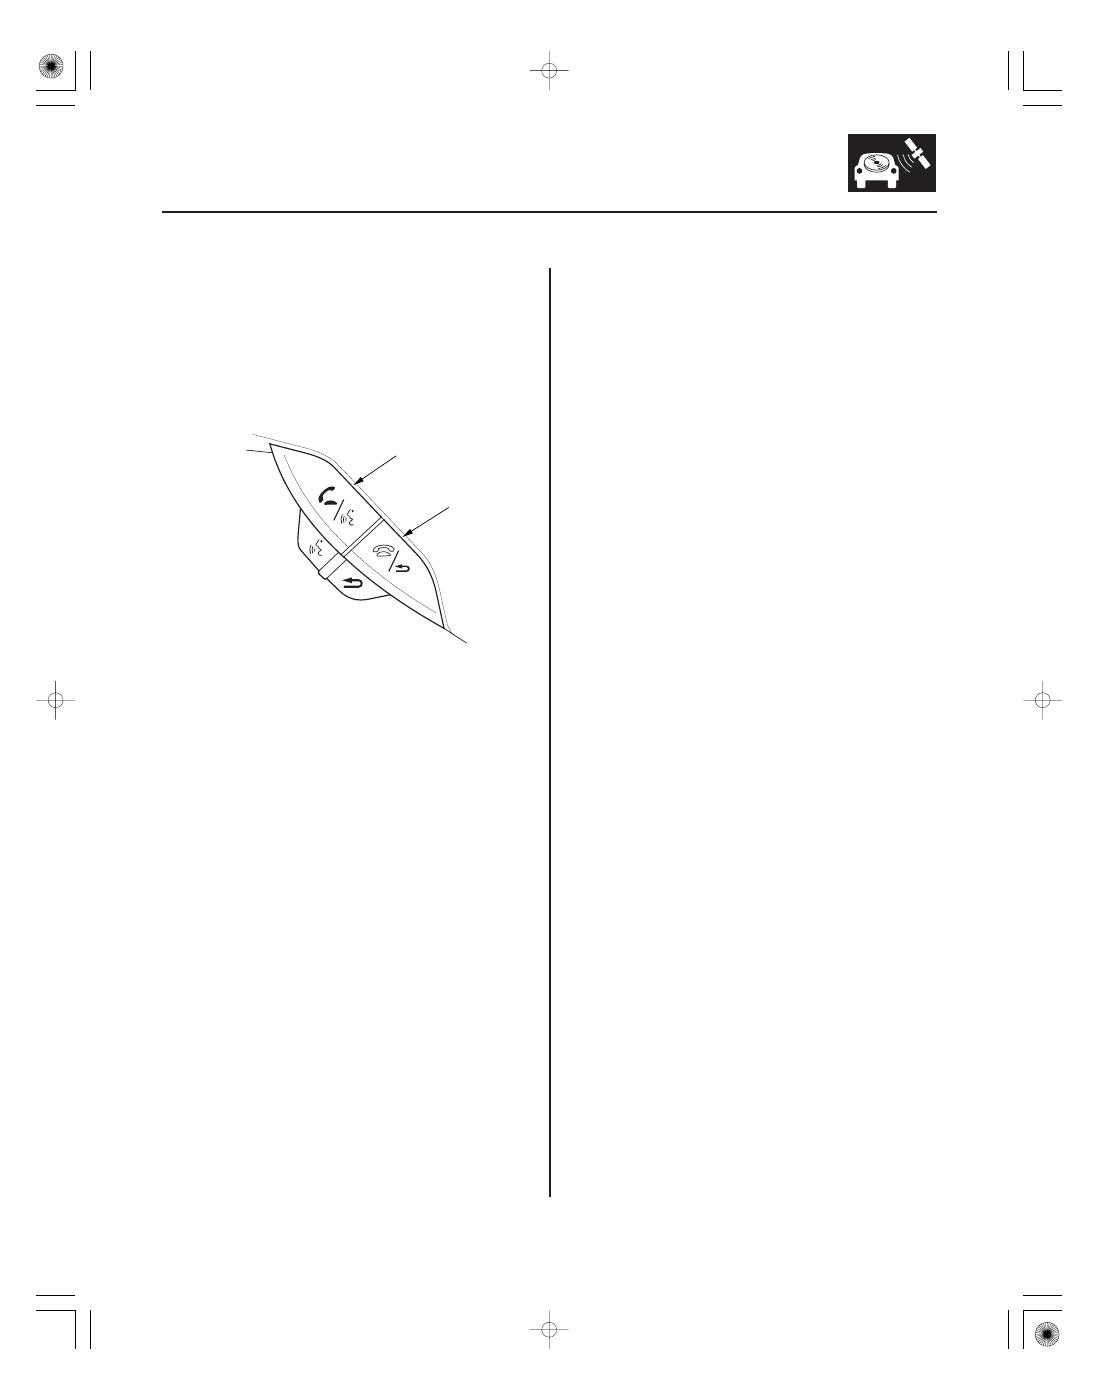 Acura Csx Navigation Wiring Diagram Simple Schema Manual Part 665 Winnebago